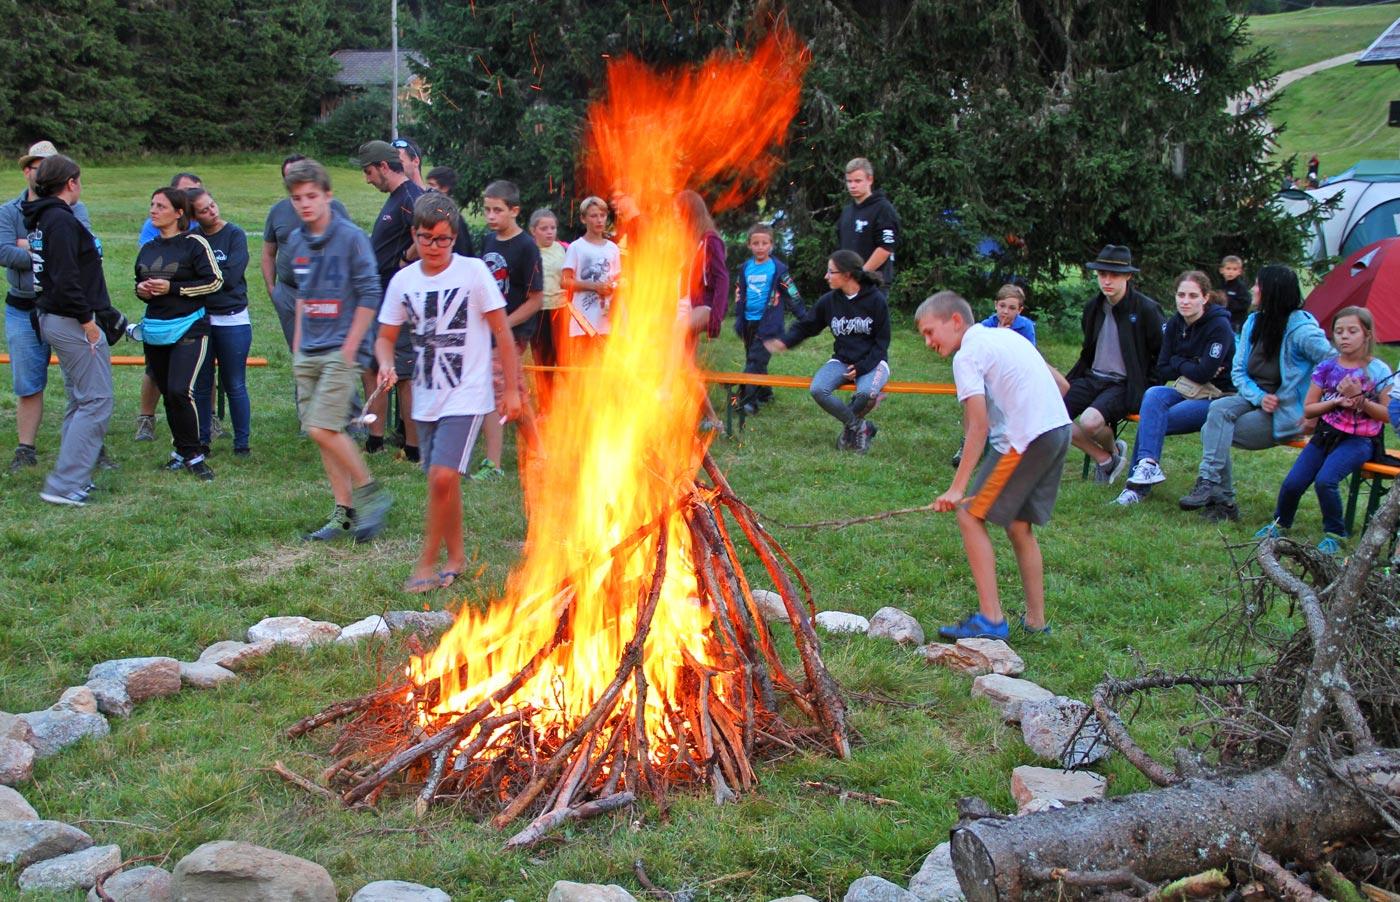 Jungschützenzeltlager 2017 auf dem Vigiljoch